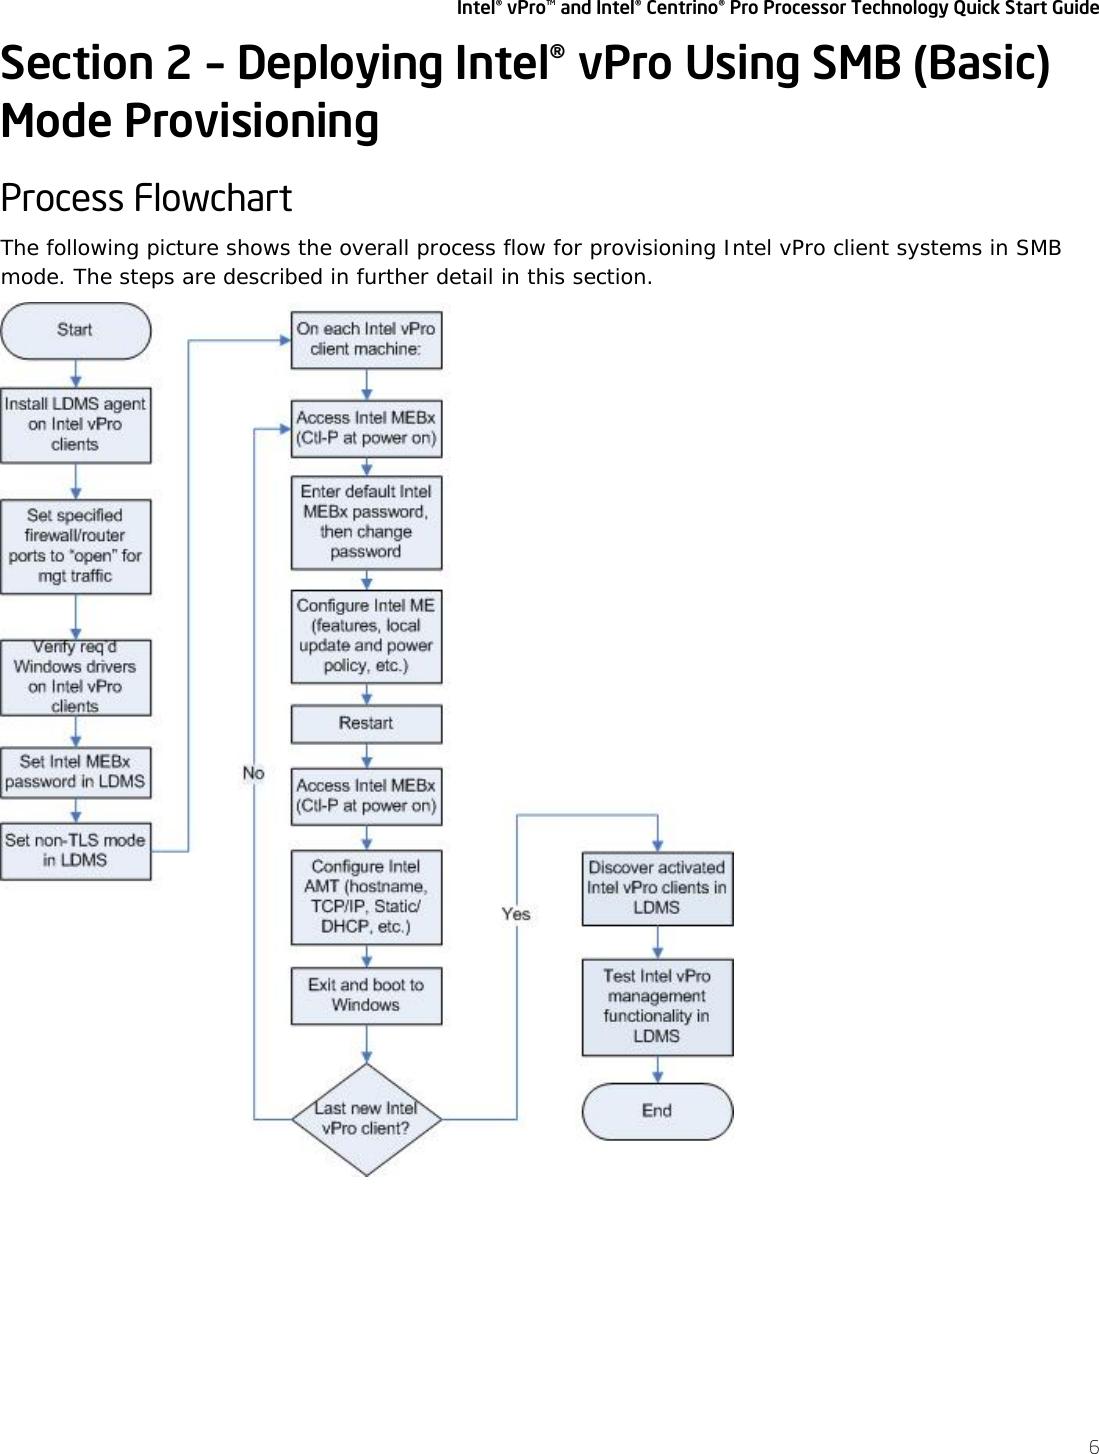 Intel Centrino Pro Users Manual